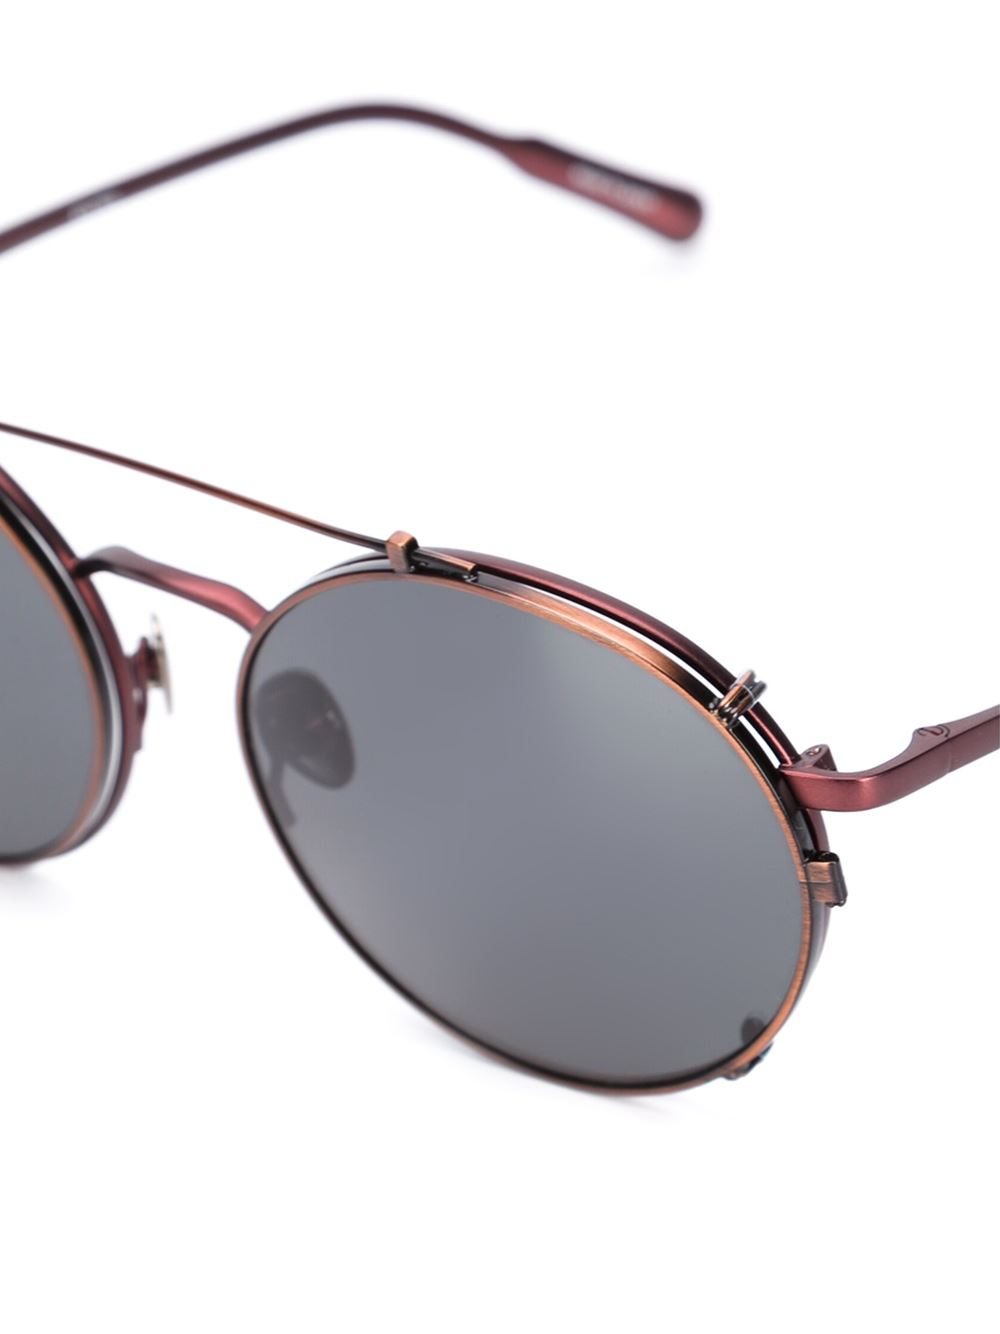 Vans Glasses Frame : Kris van assche Round Frame Sunglasses in Black Lyst